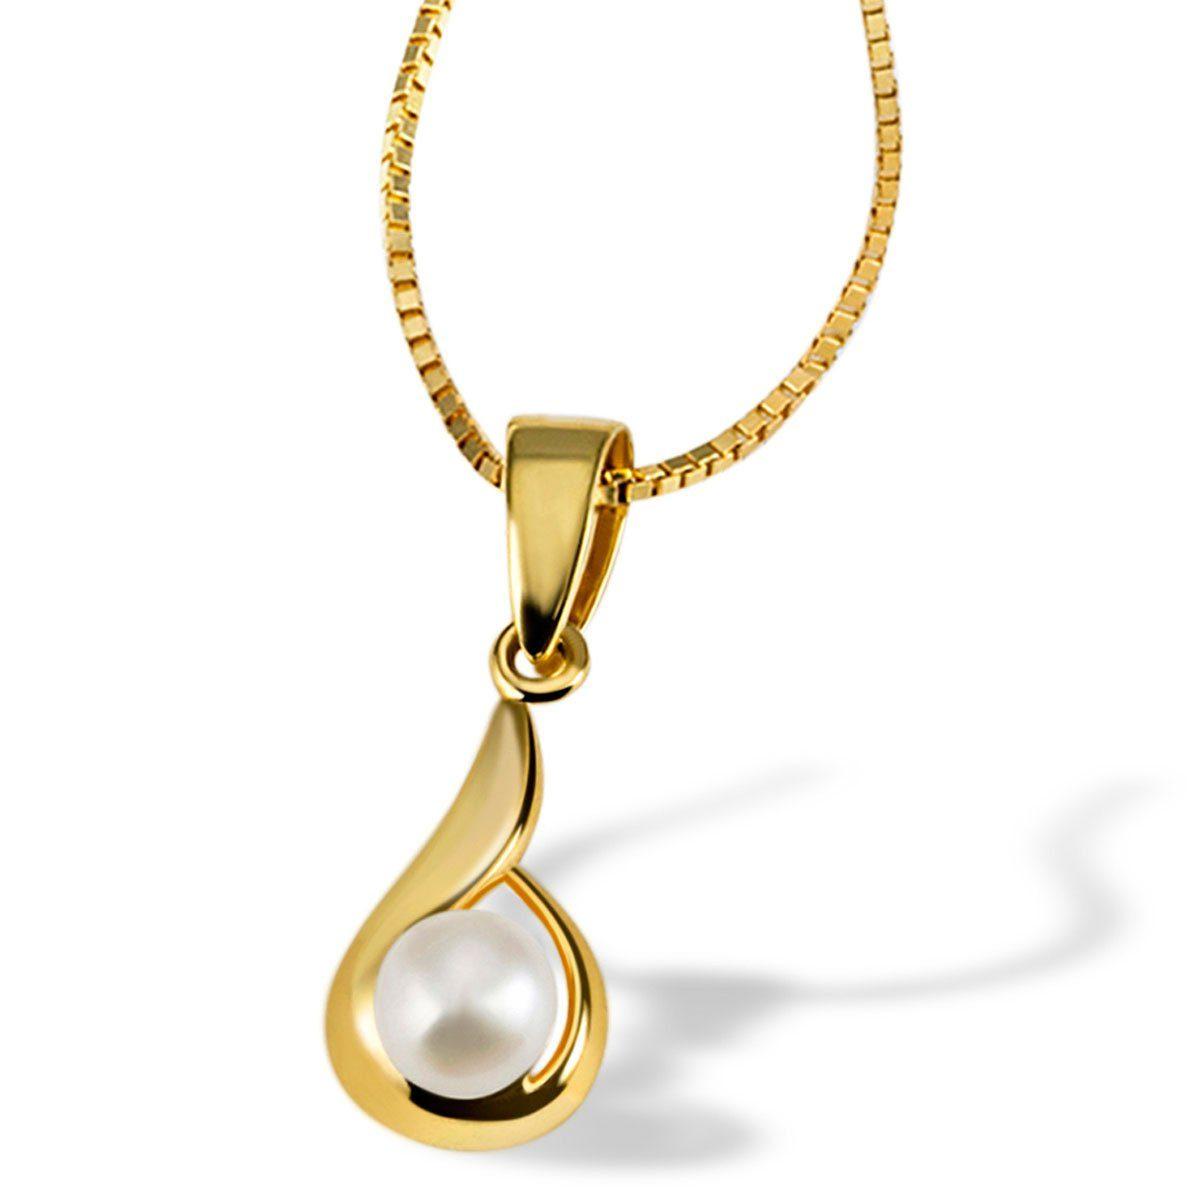 goldmaid Collier Tropfen 375 Gelbgold 1 Perle